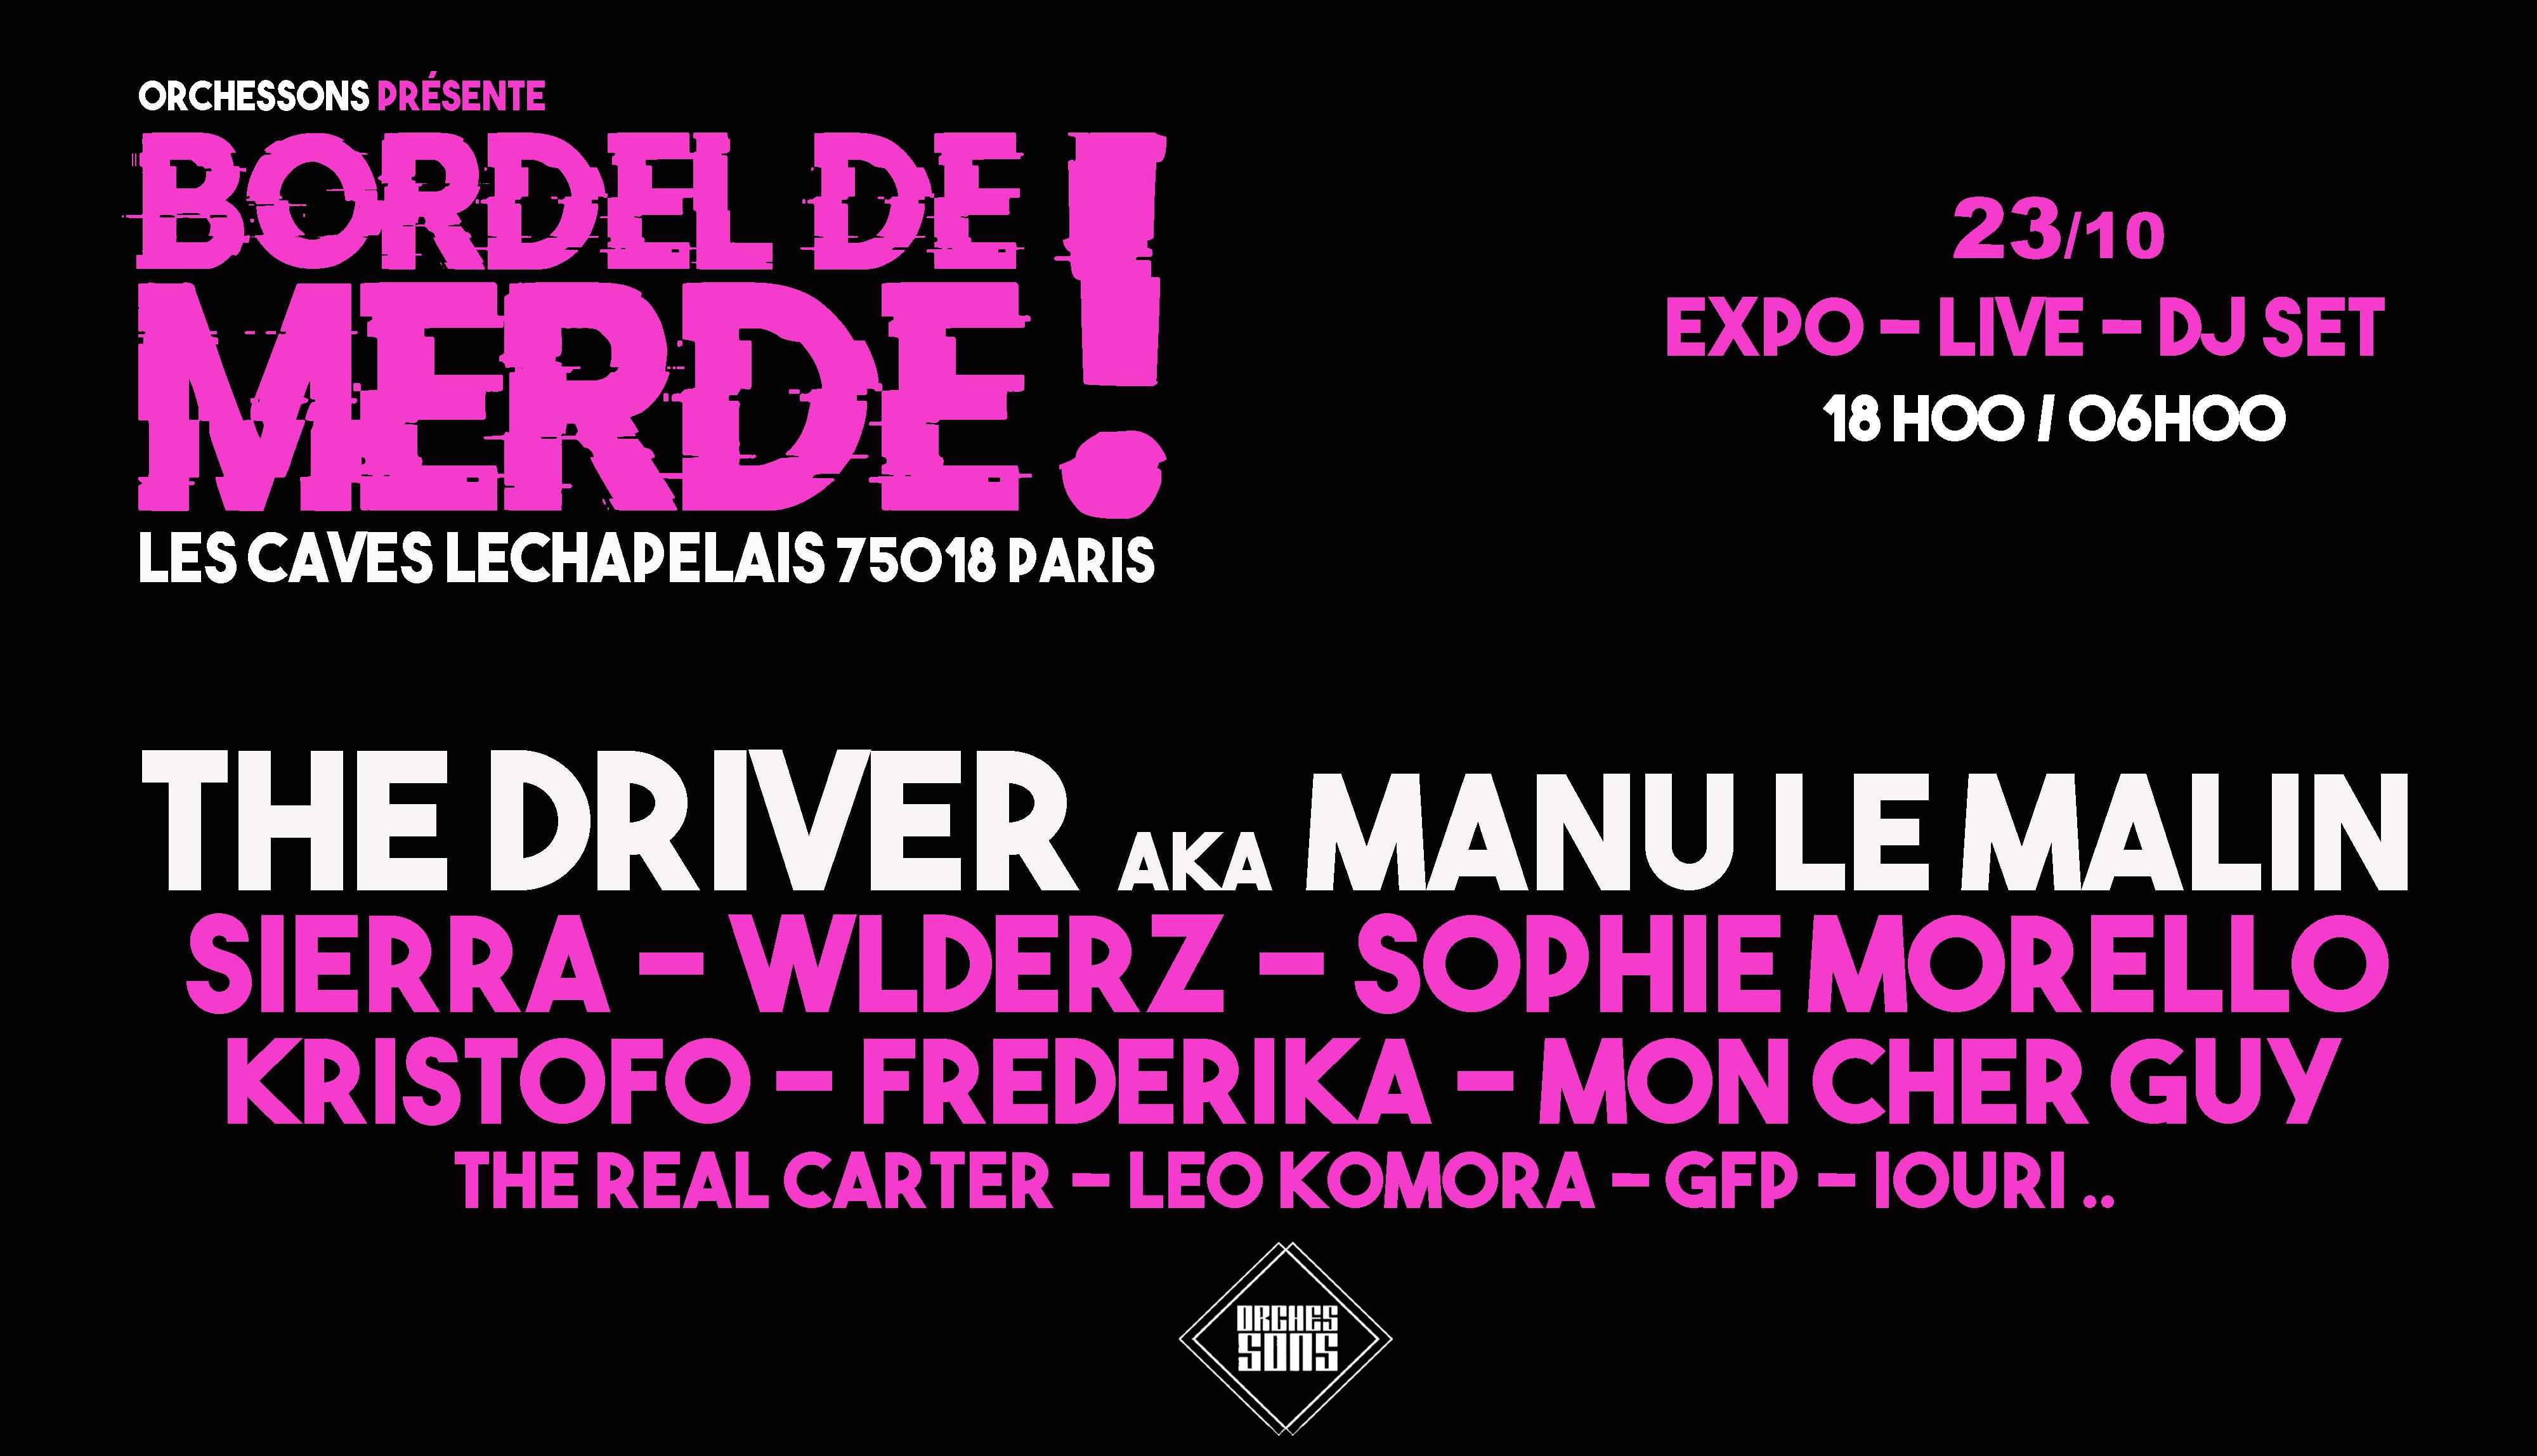 BORDEL DE MERDE - The Driver aka Manu le Malin, Wlderz, Sierra...